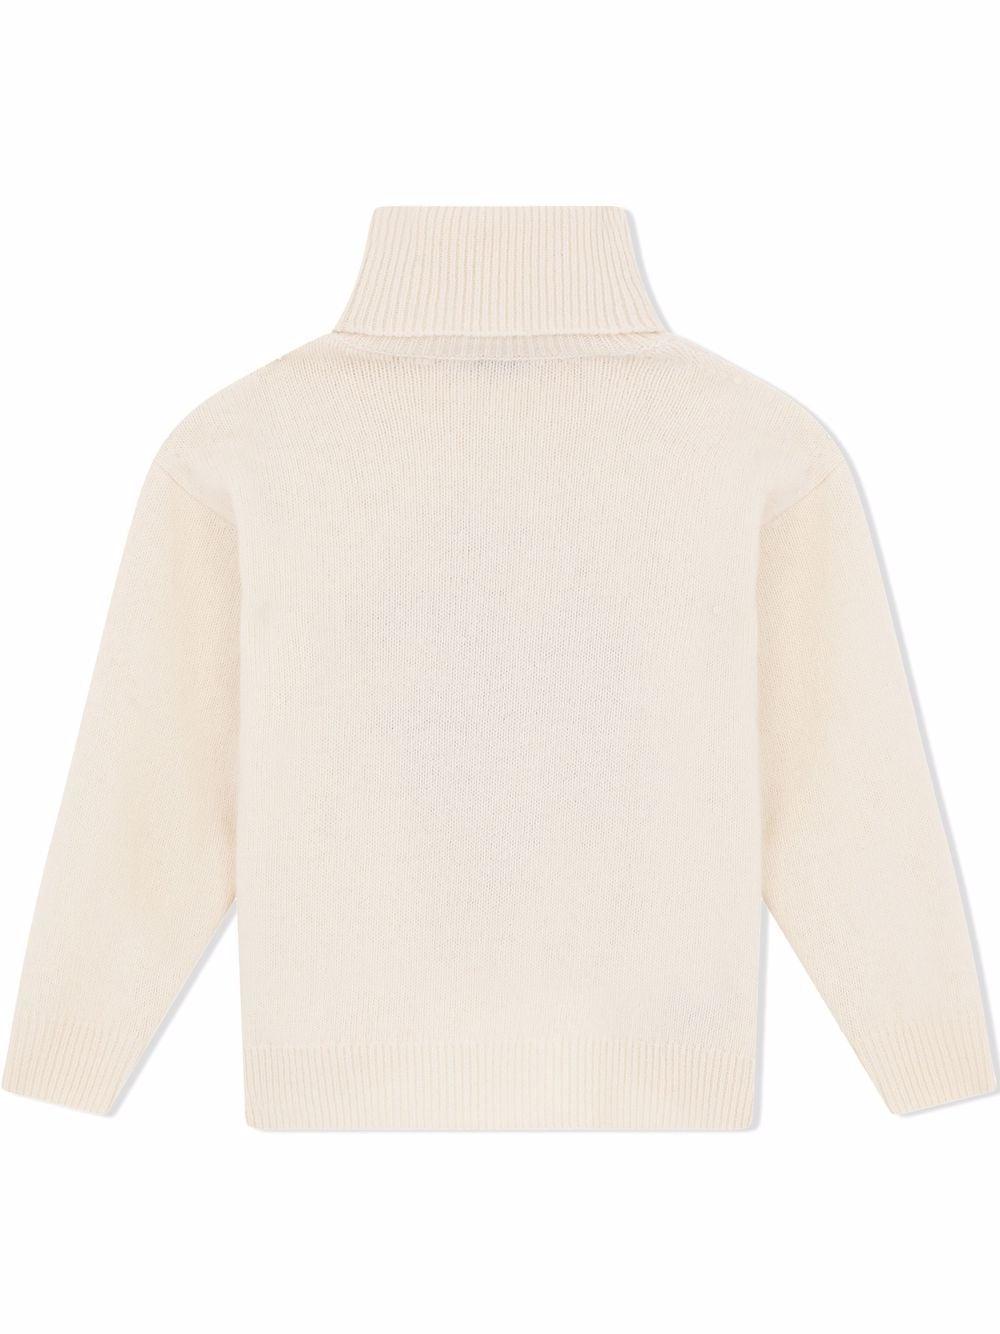 Sweater Dolce & Gabbana kids  DOLCE&GABBANA KIDS | 1 | L5KWF6JBVK4W0800